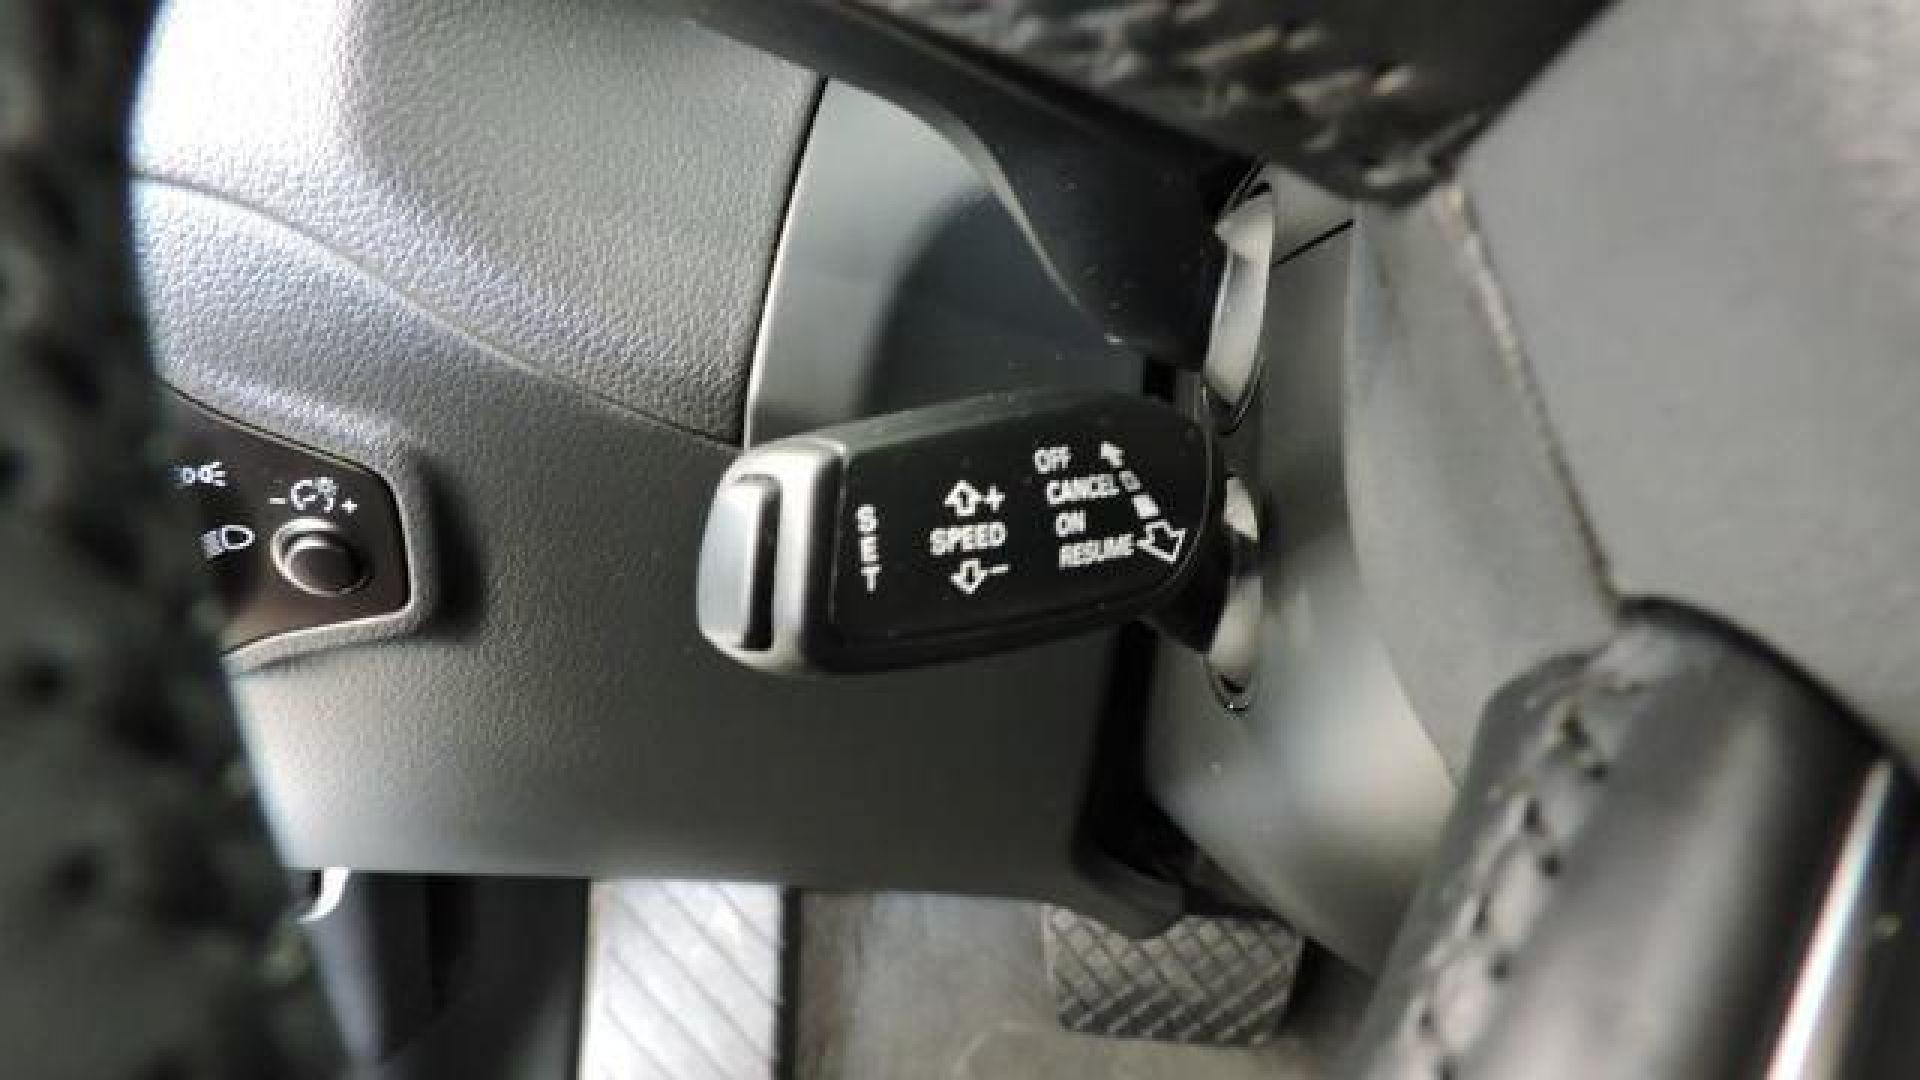 Audi Q5 Advanced edition 2.0 TDI clean diesel quattro 140 kW (190 CV) S tronic